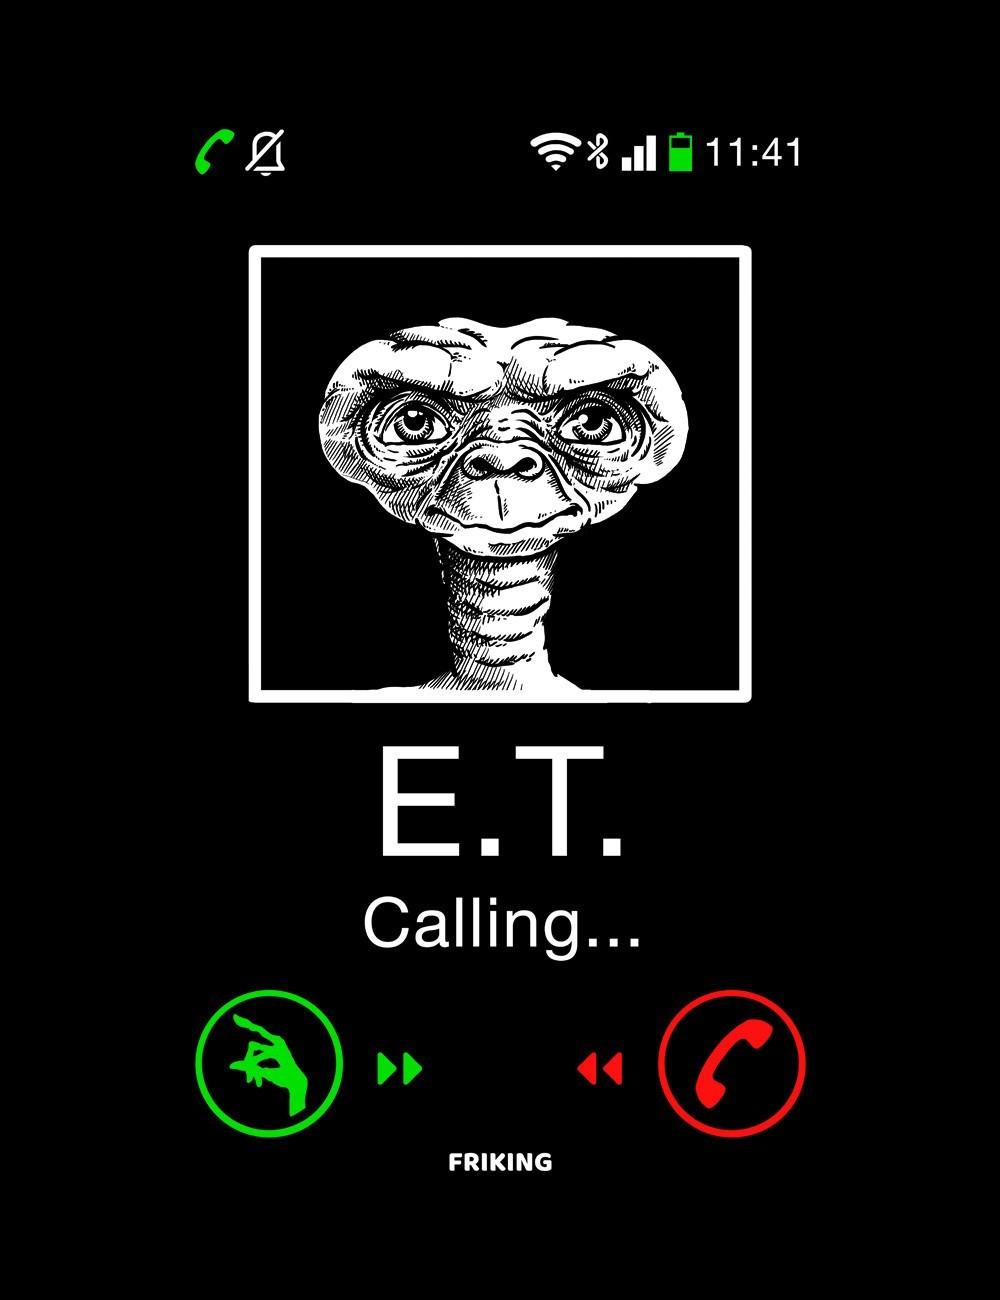 E.T. Calling